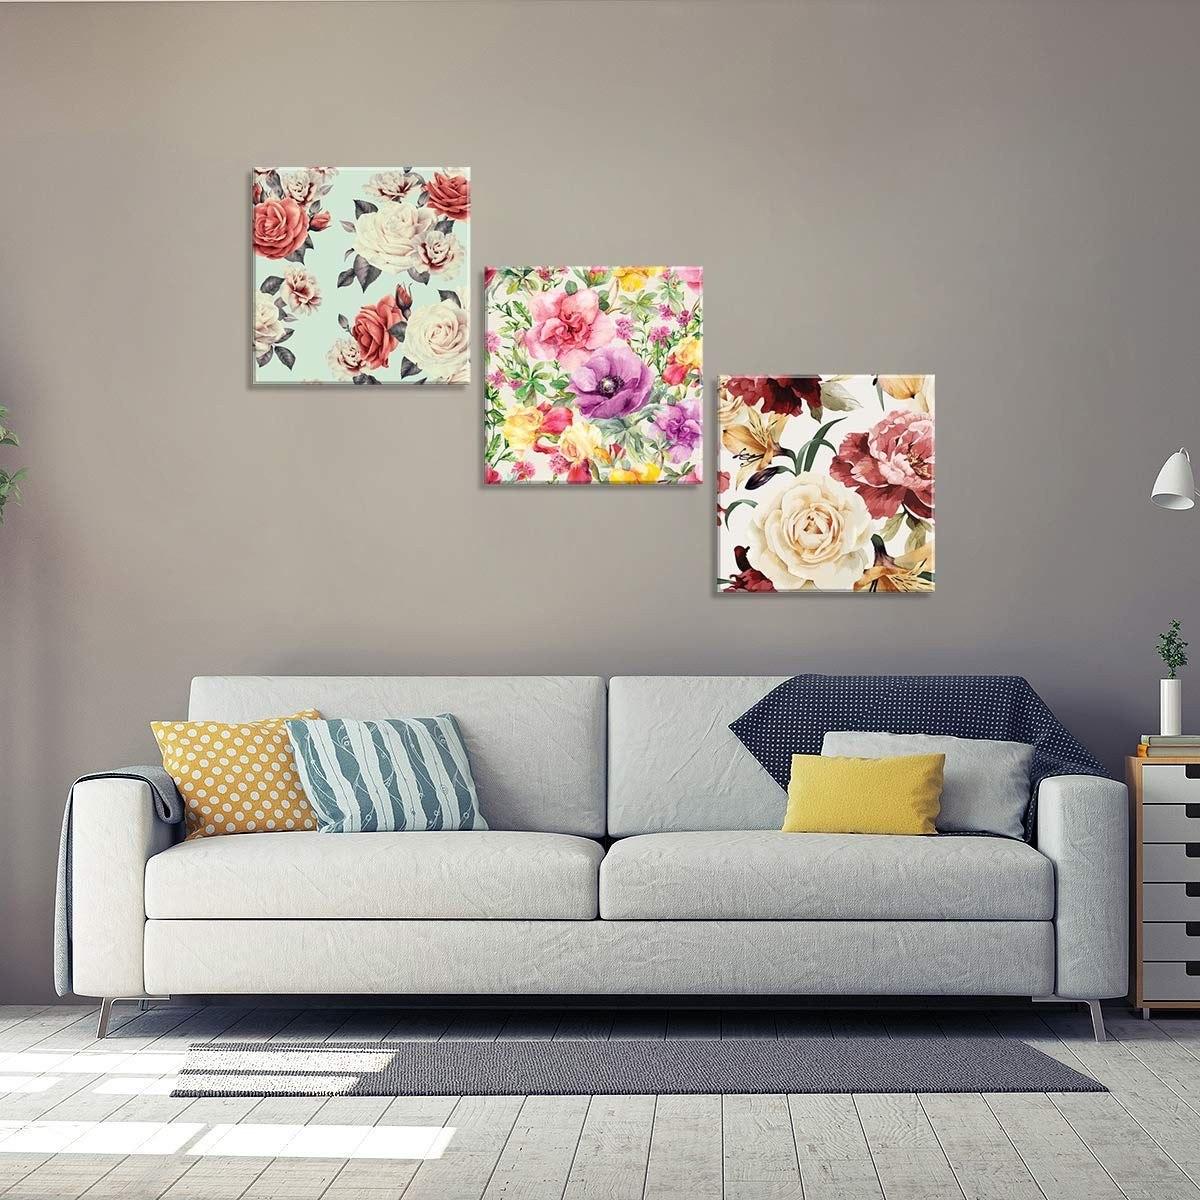 74eeb5bbc conjunto de 3 telas decorativas em canvas traços florais úni. Carregando  zoom.